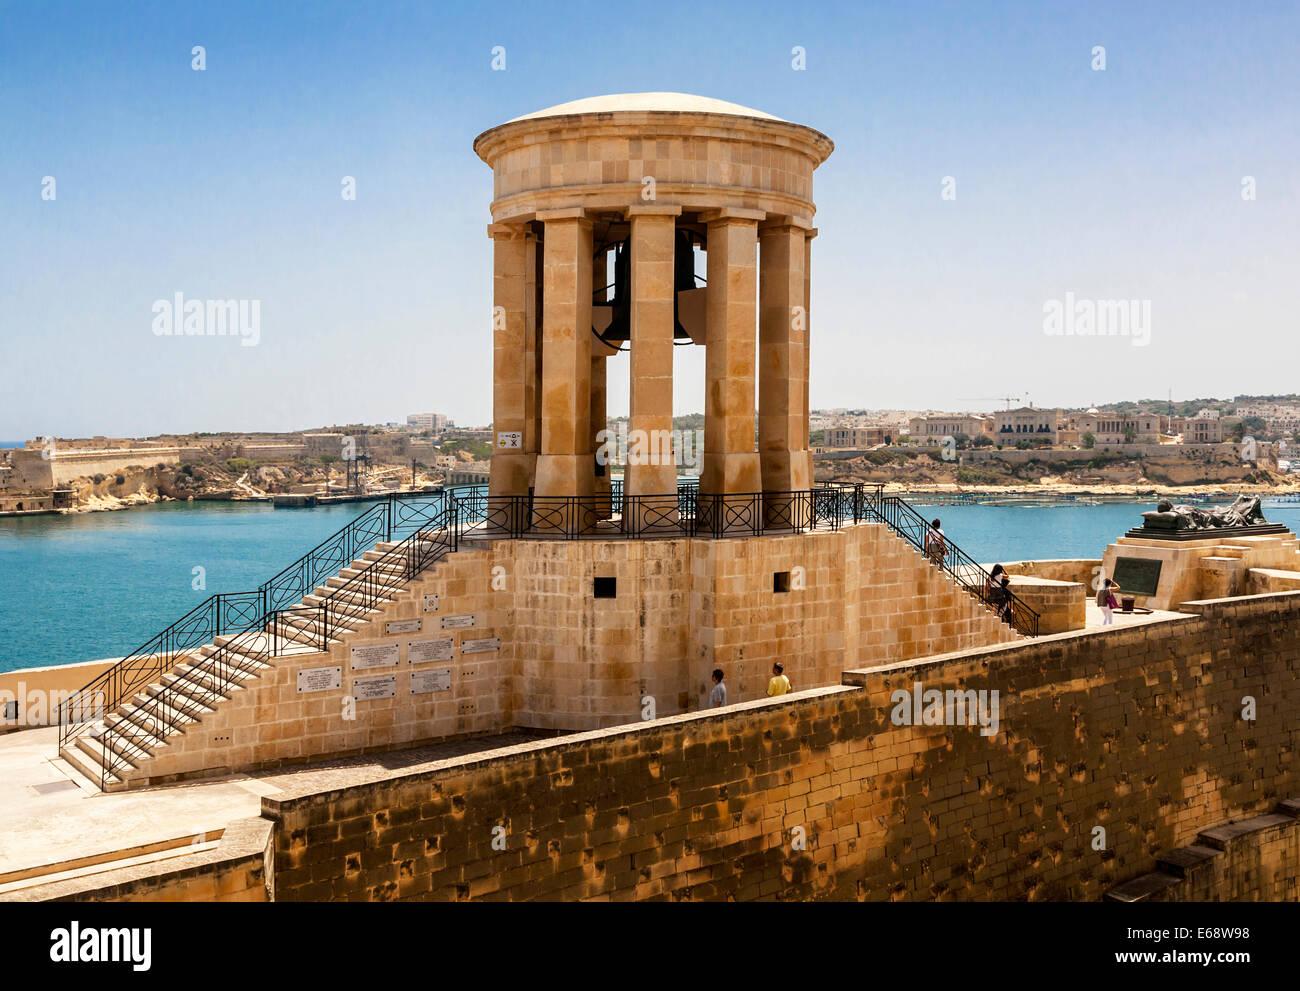 The Siege Bell War Memorial  at Lower Barrakka Gardens, Valletta, Malta - Stock Image